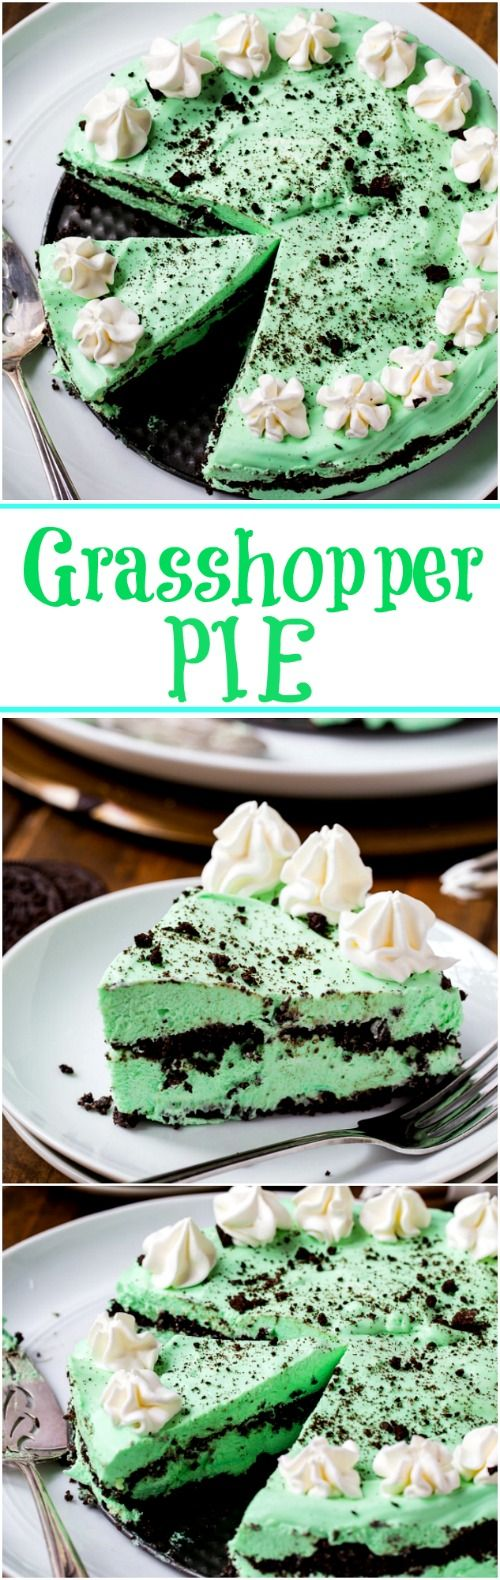 No Bake Grasshopper Cheesecake Pie